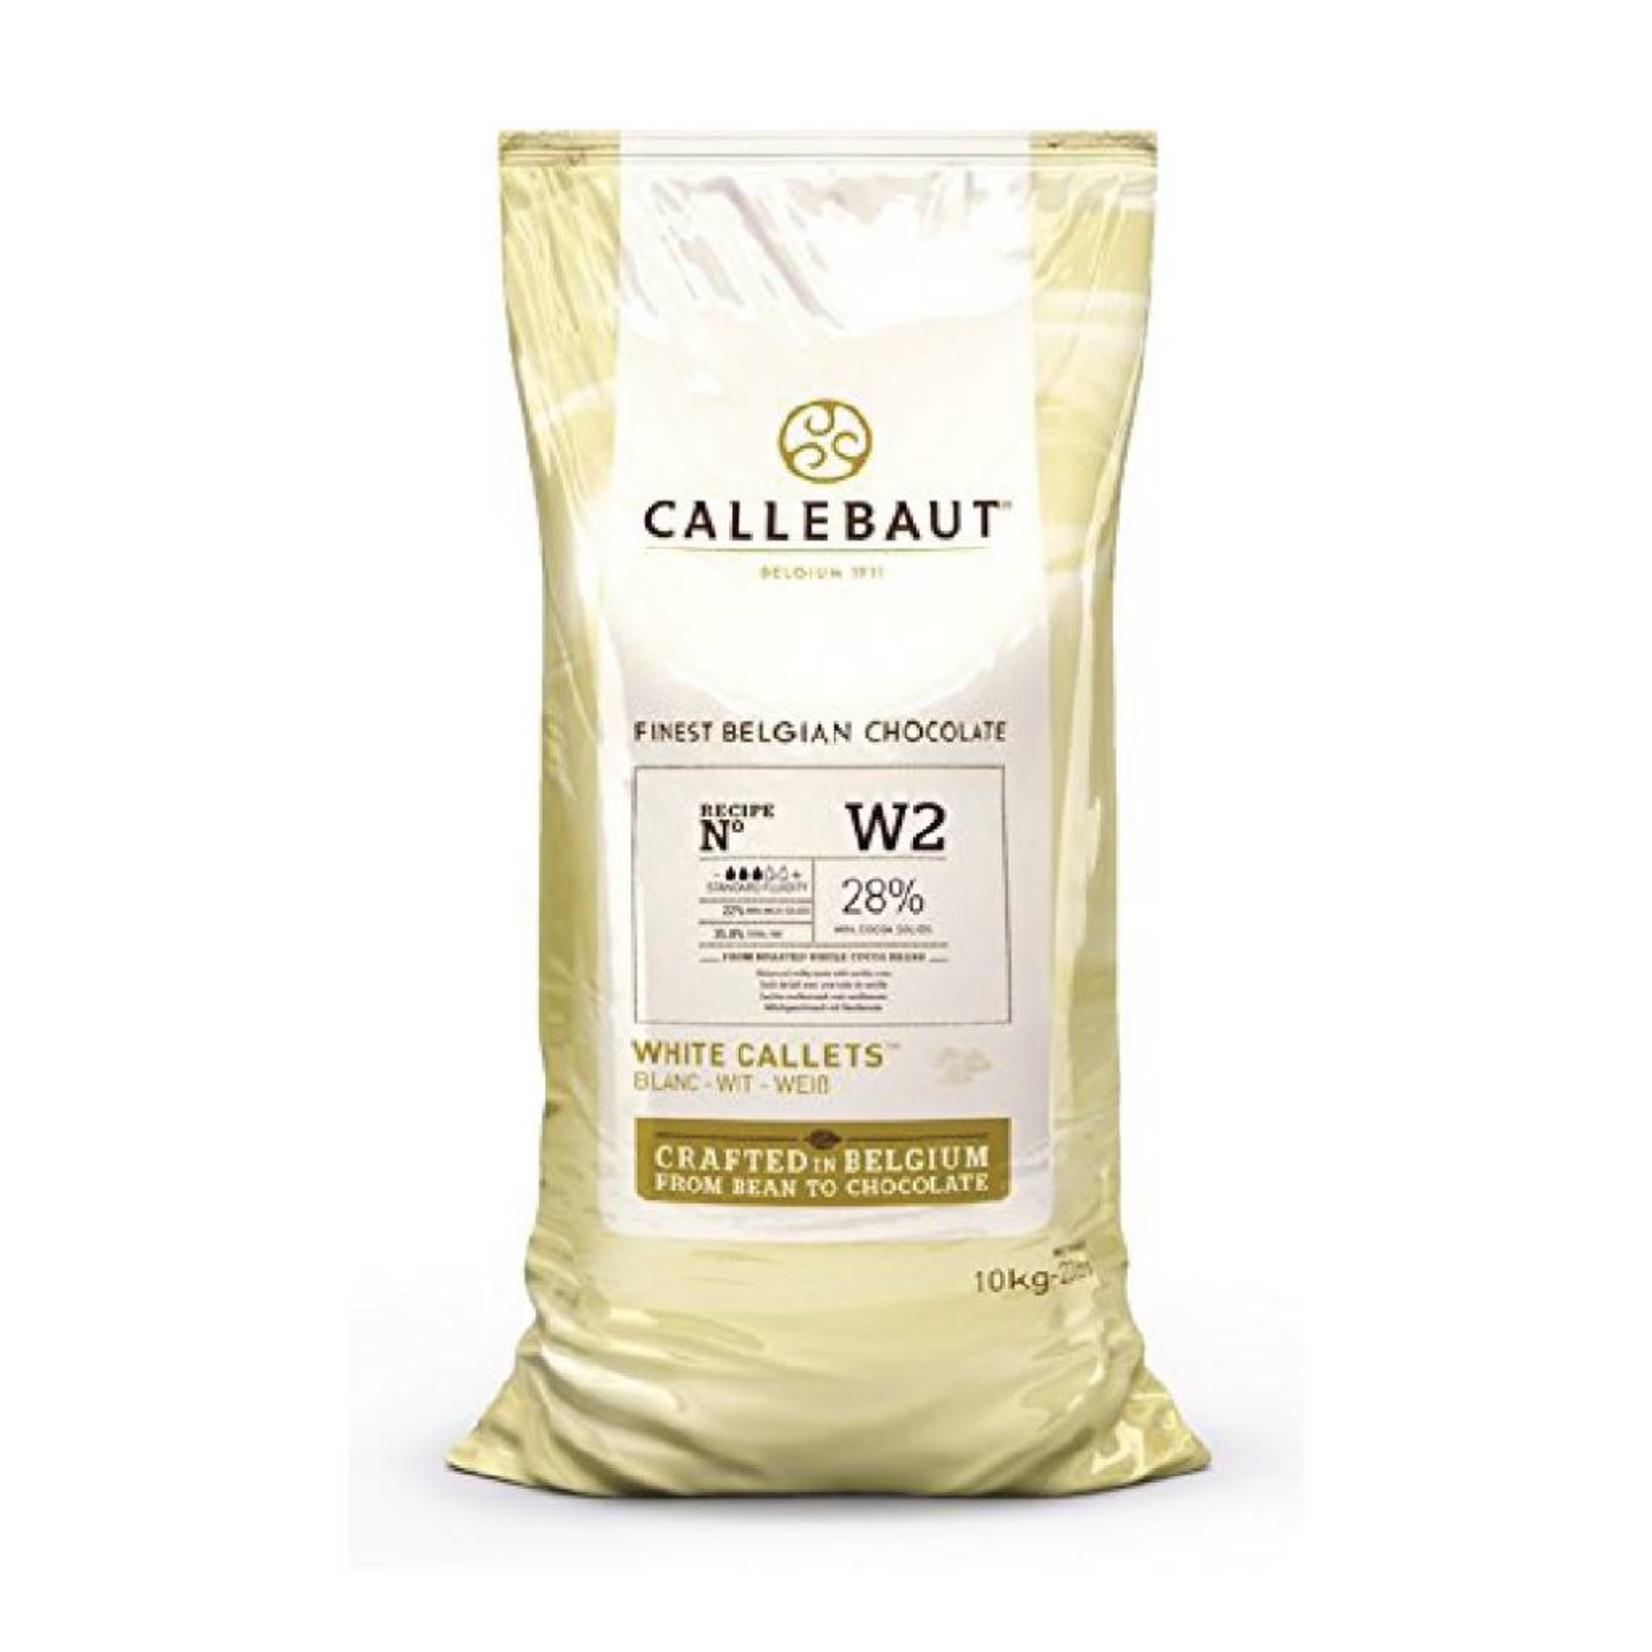 Barry Callebaut Barry Callebaut - W2 White Chocolate 28% - 10kg/22lb, W2NV-595